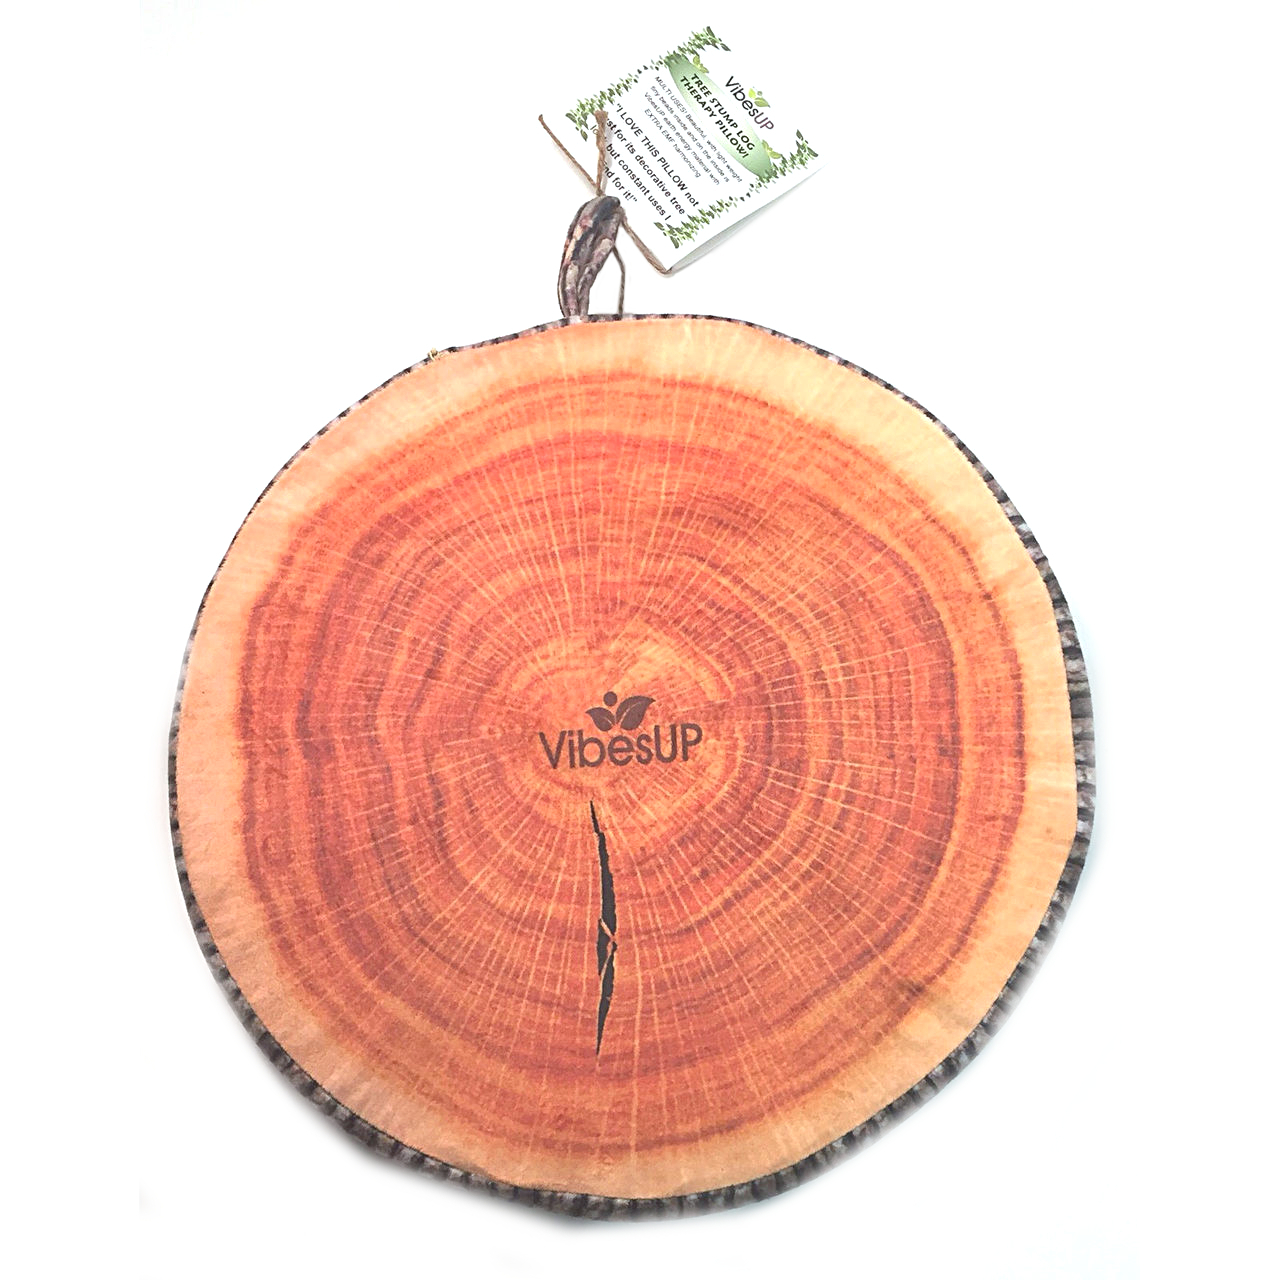 stump-48501.1480959340.1280.1280-55873.1499628568.1280.1280.jpg